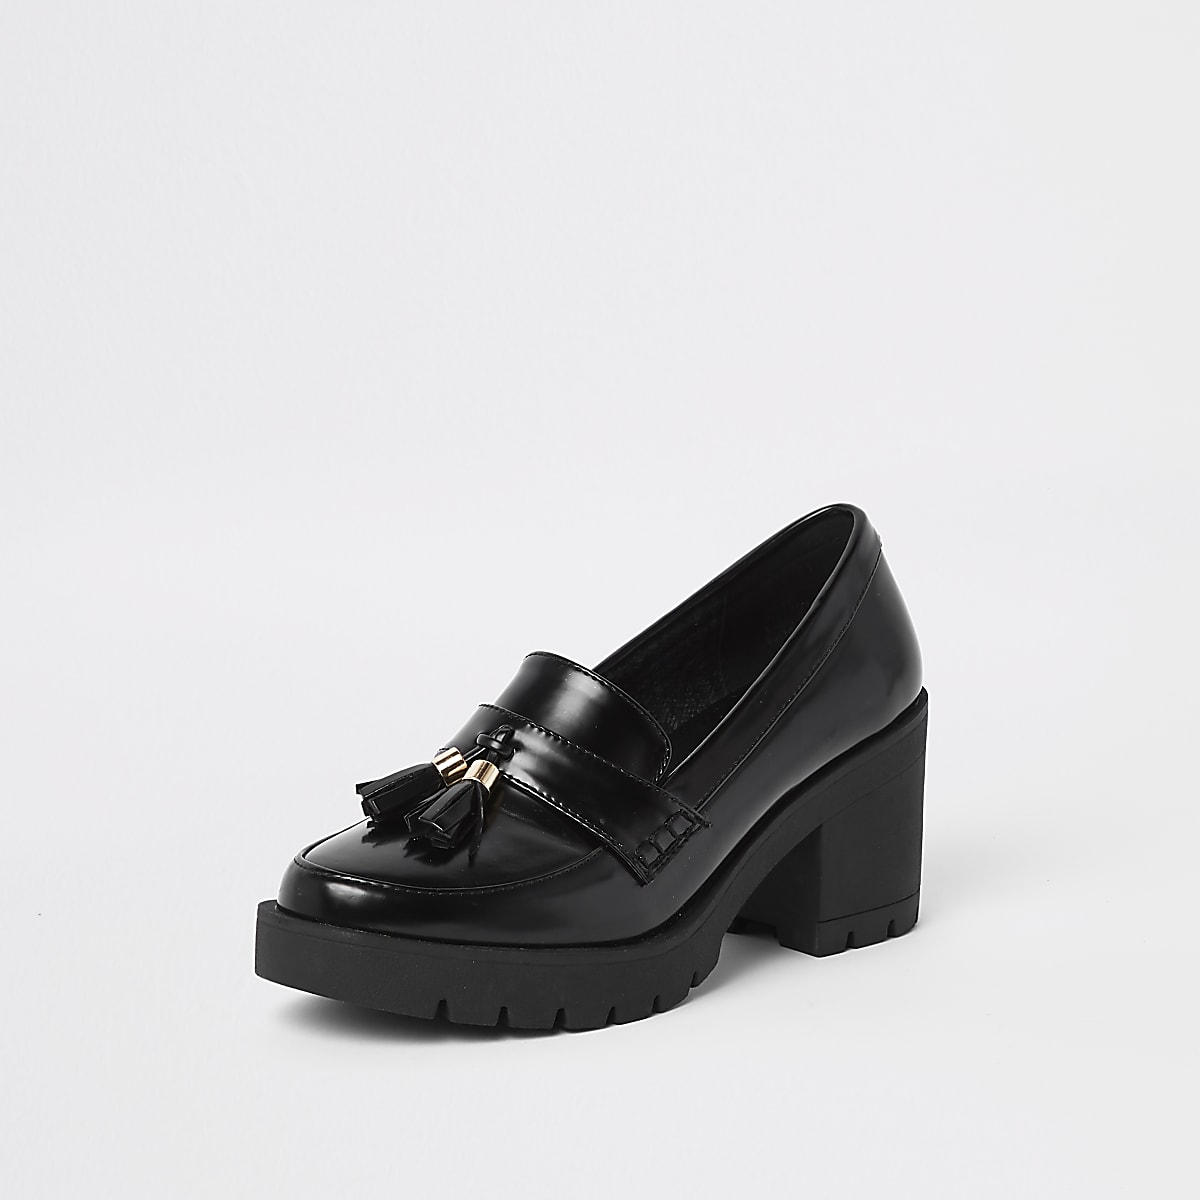 8ddbb842791b Black chunky tassel block heel loafers - Shoes - Shoes   Boots - women